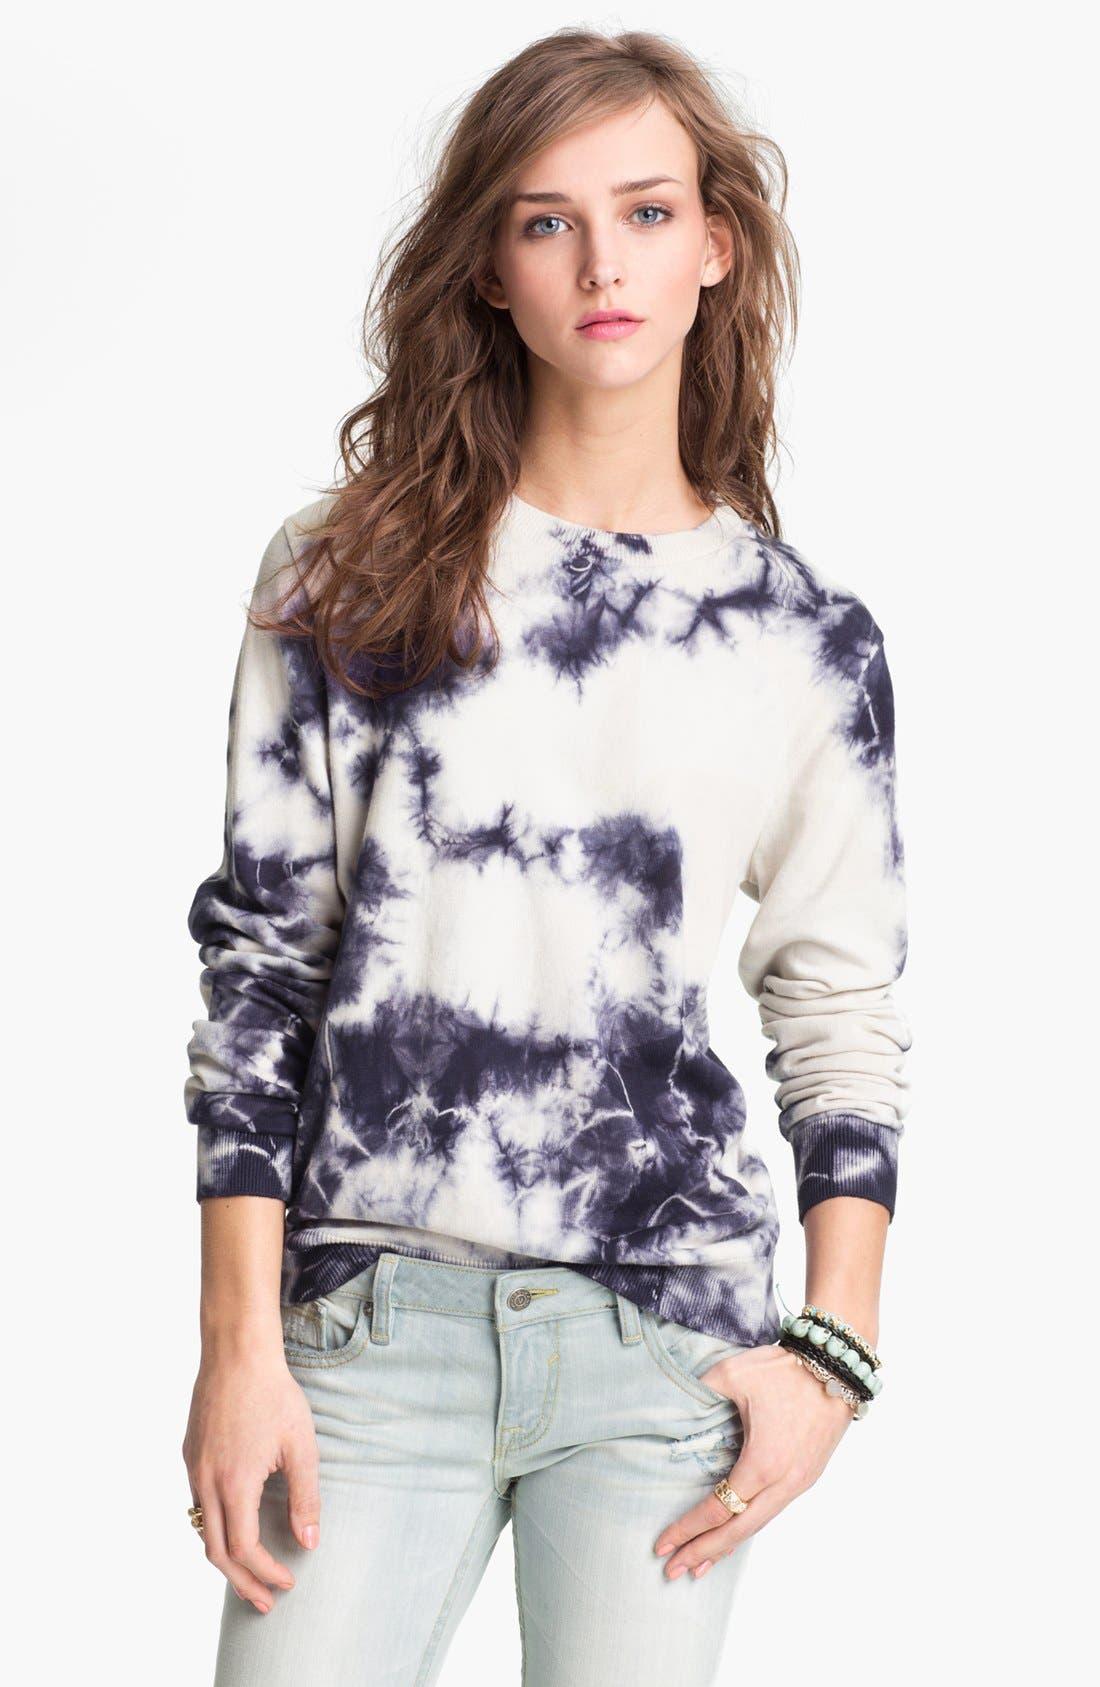 Alternate Image 1 Selected - Truehitt Tie Dye Crewneck Sweater (Juniors)